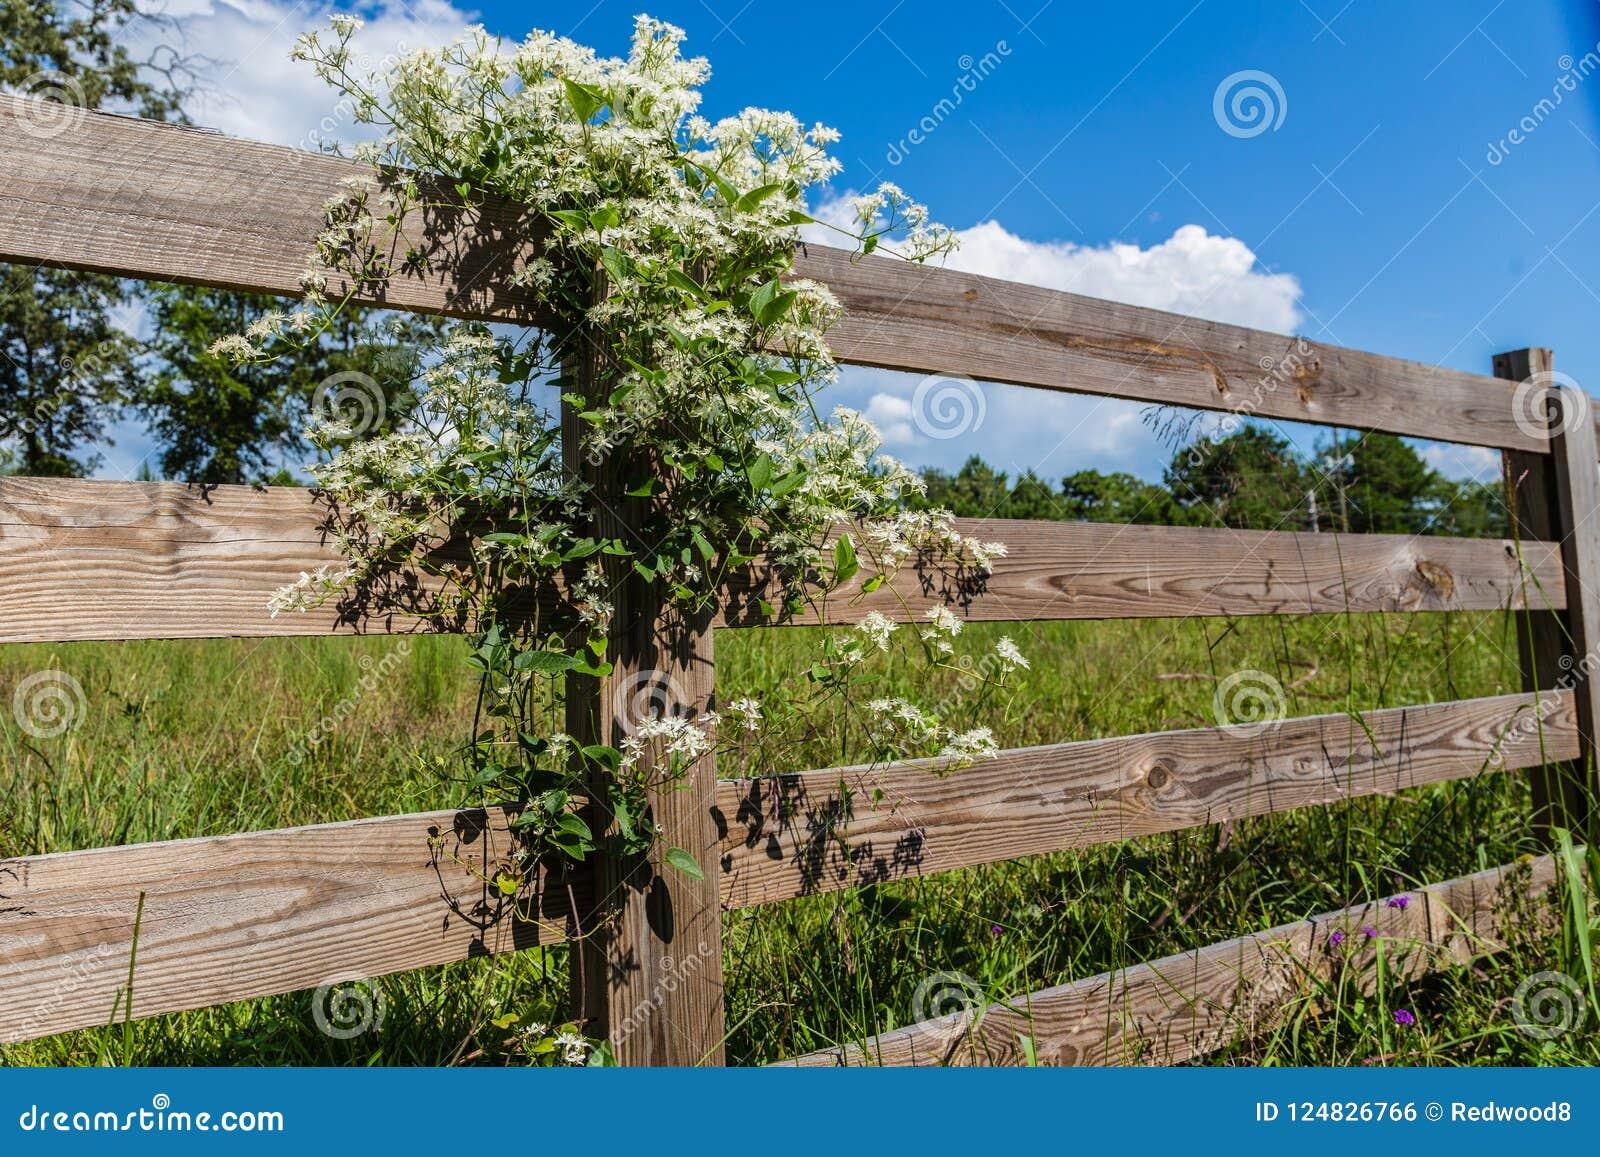 Zoet Autumn Clematis White Flowering Vine